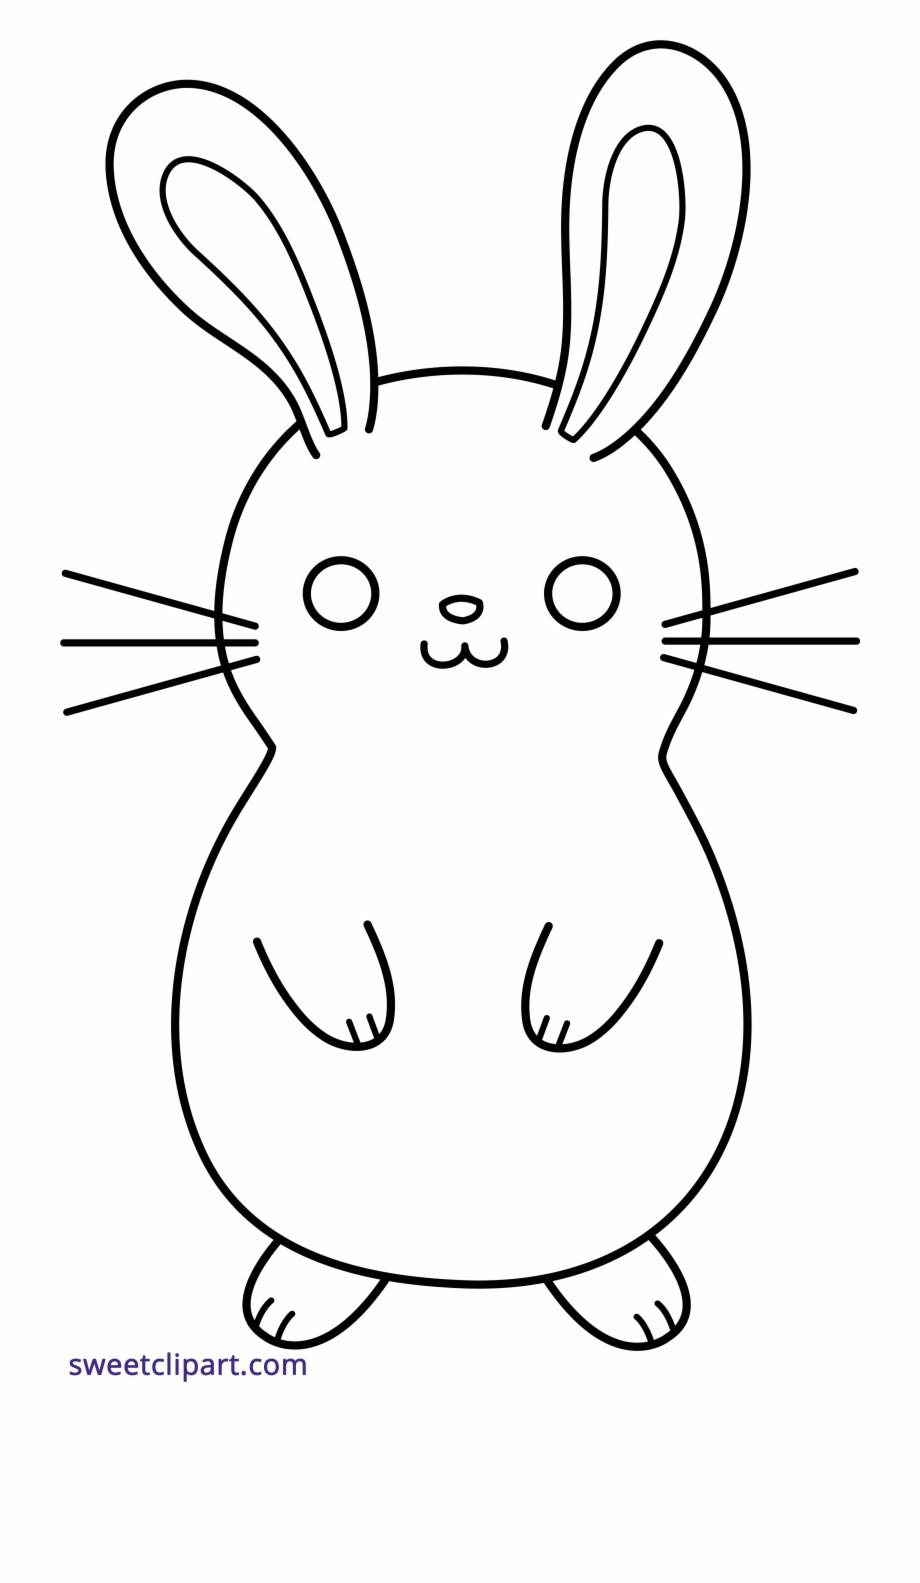 Stock Bunny Rabbit Cute Lineart Black White Clipart.